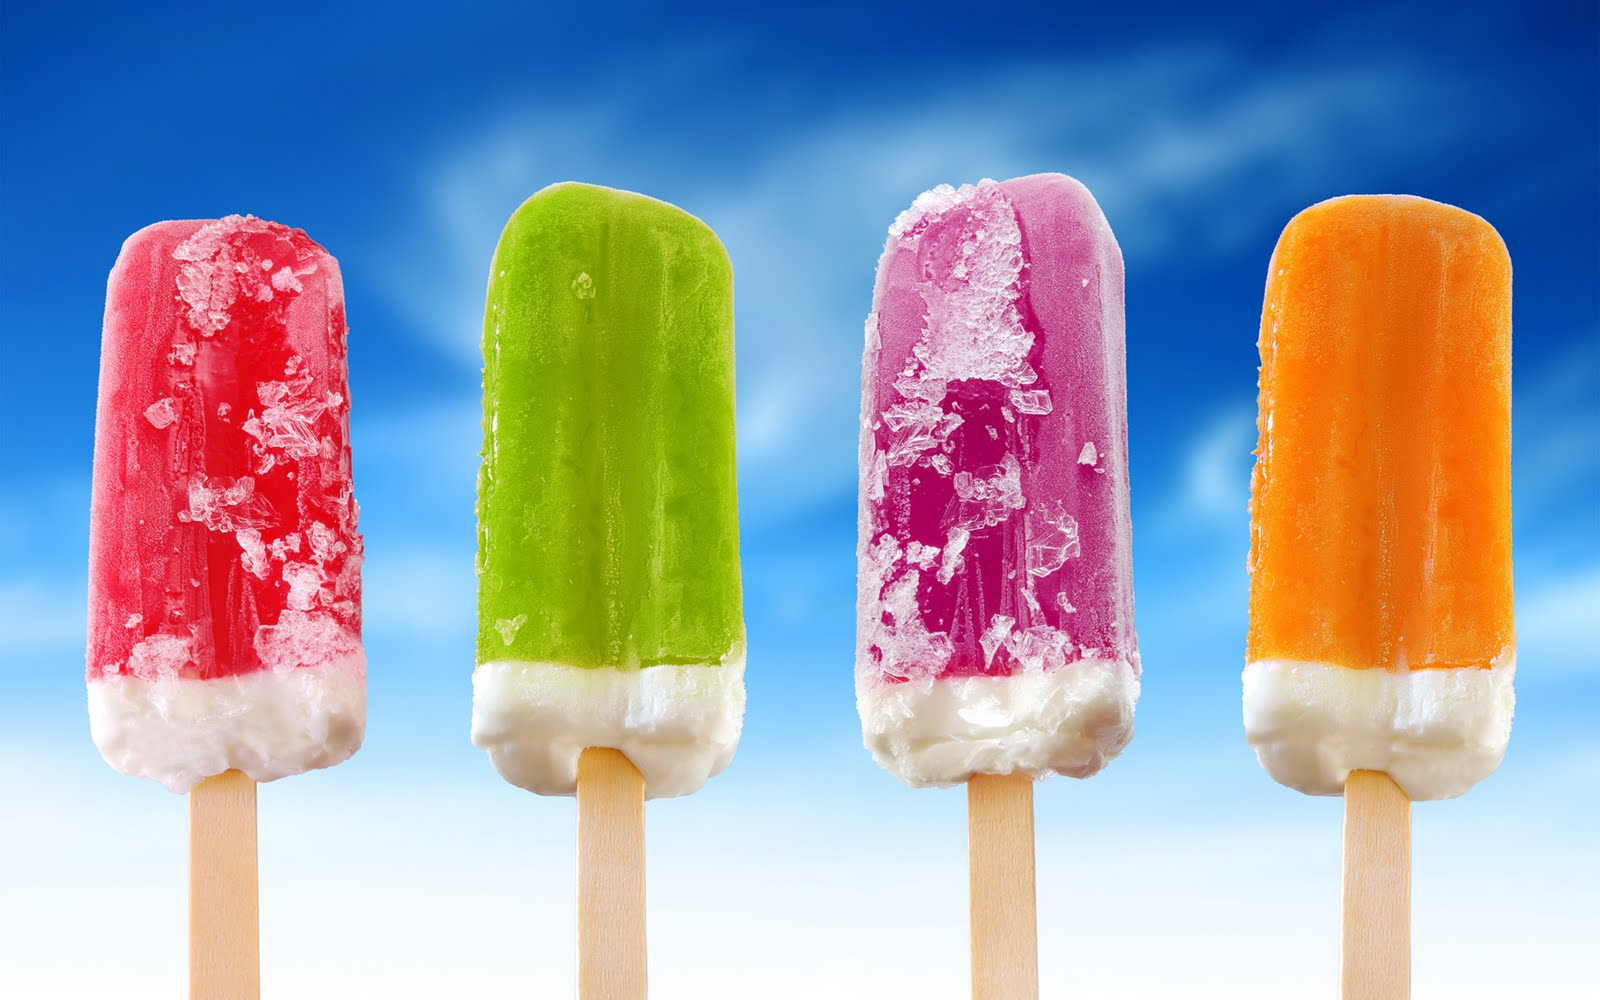 http://4.bp.blogspot.com/__z7Tqs-fVLg/THLC0yOM1qI/AAAAAAAAA2k/x92yn1iBn5o/s1600/17339-desktop-wallpapers-ice-cream.jpg